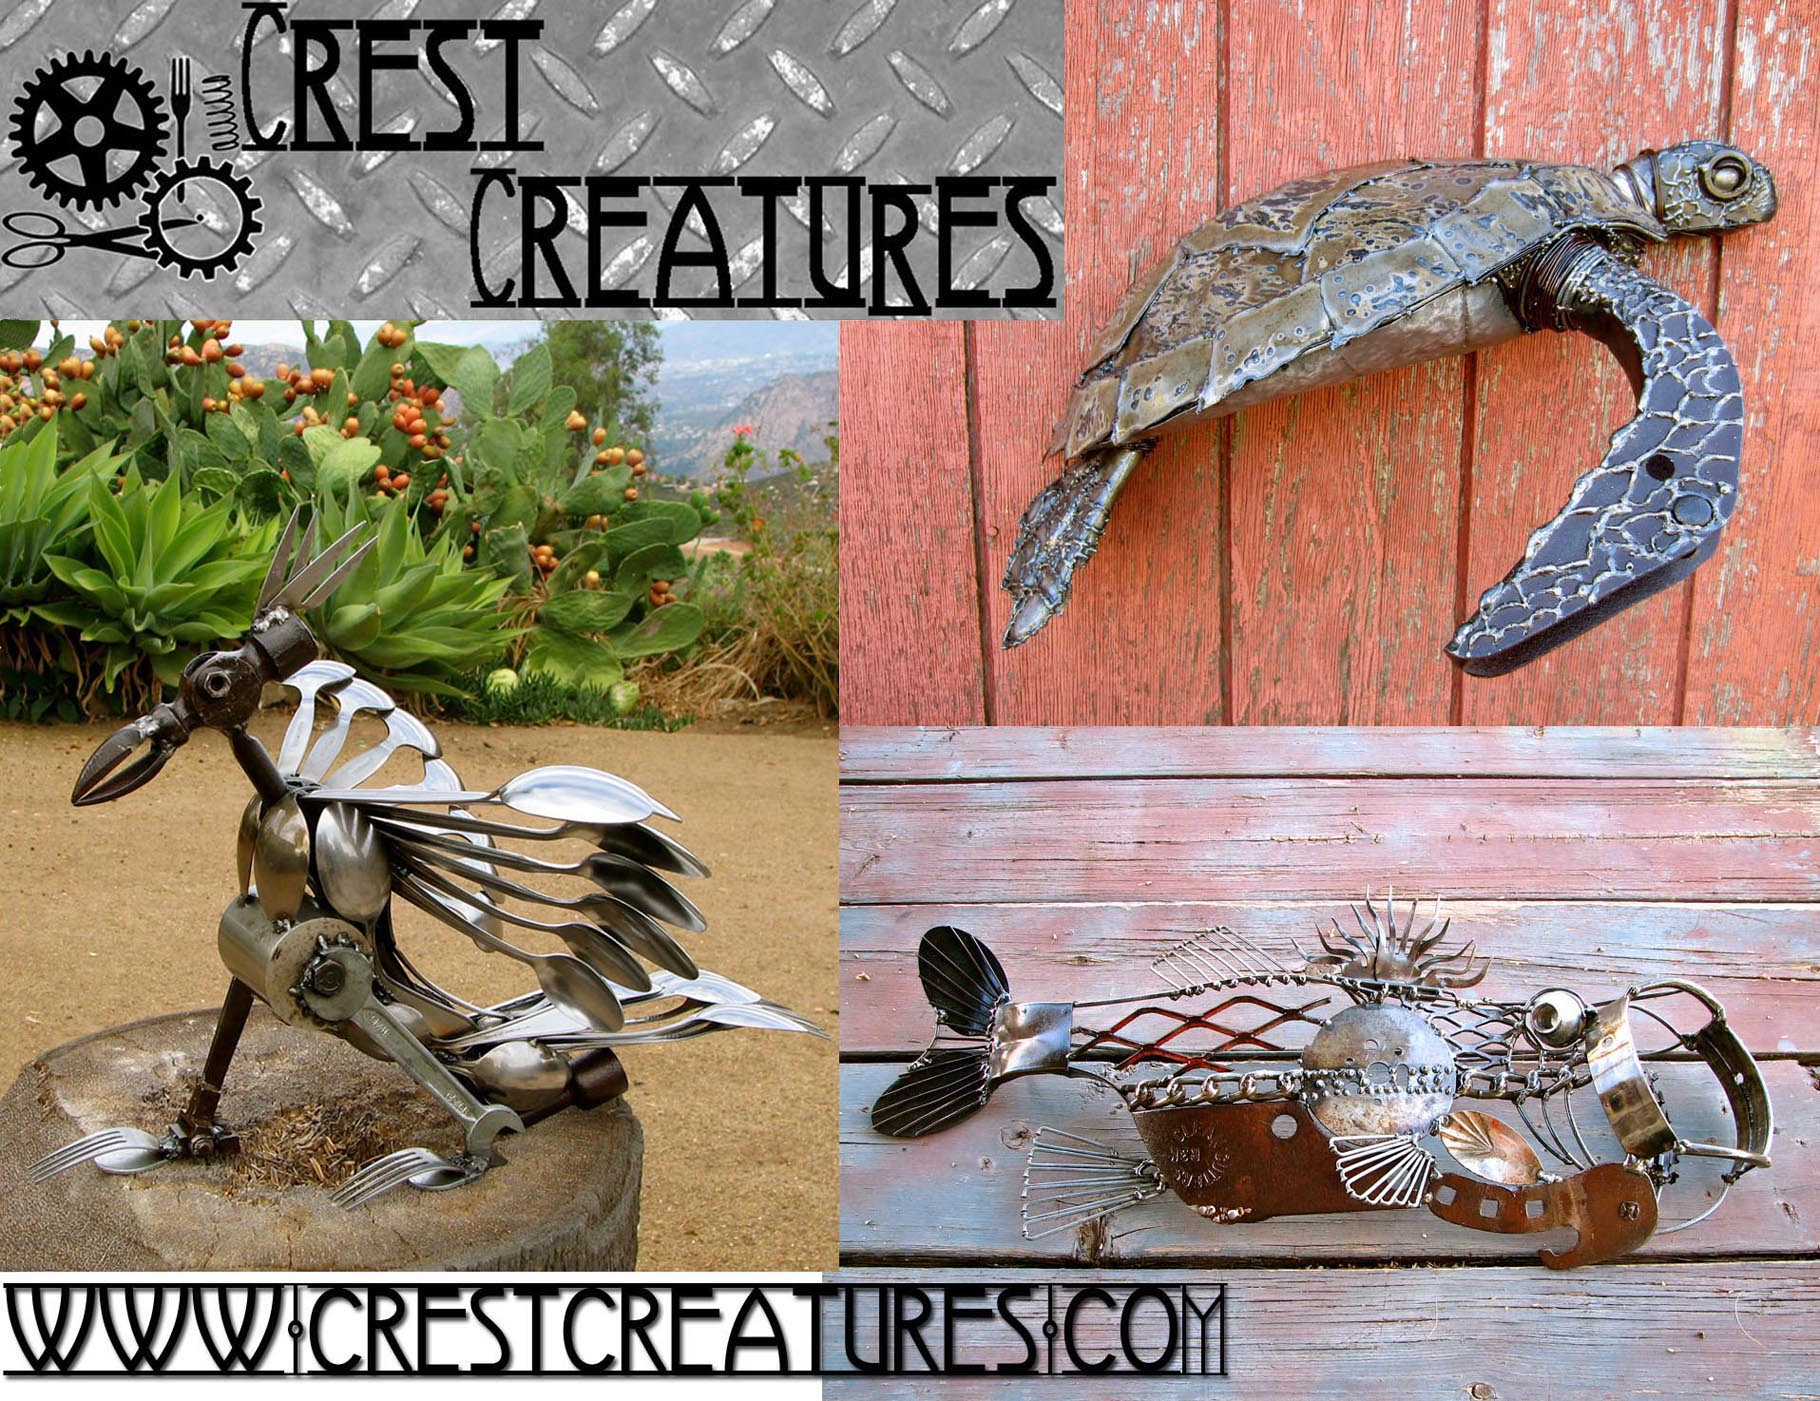 Crest Creatures Postcard